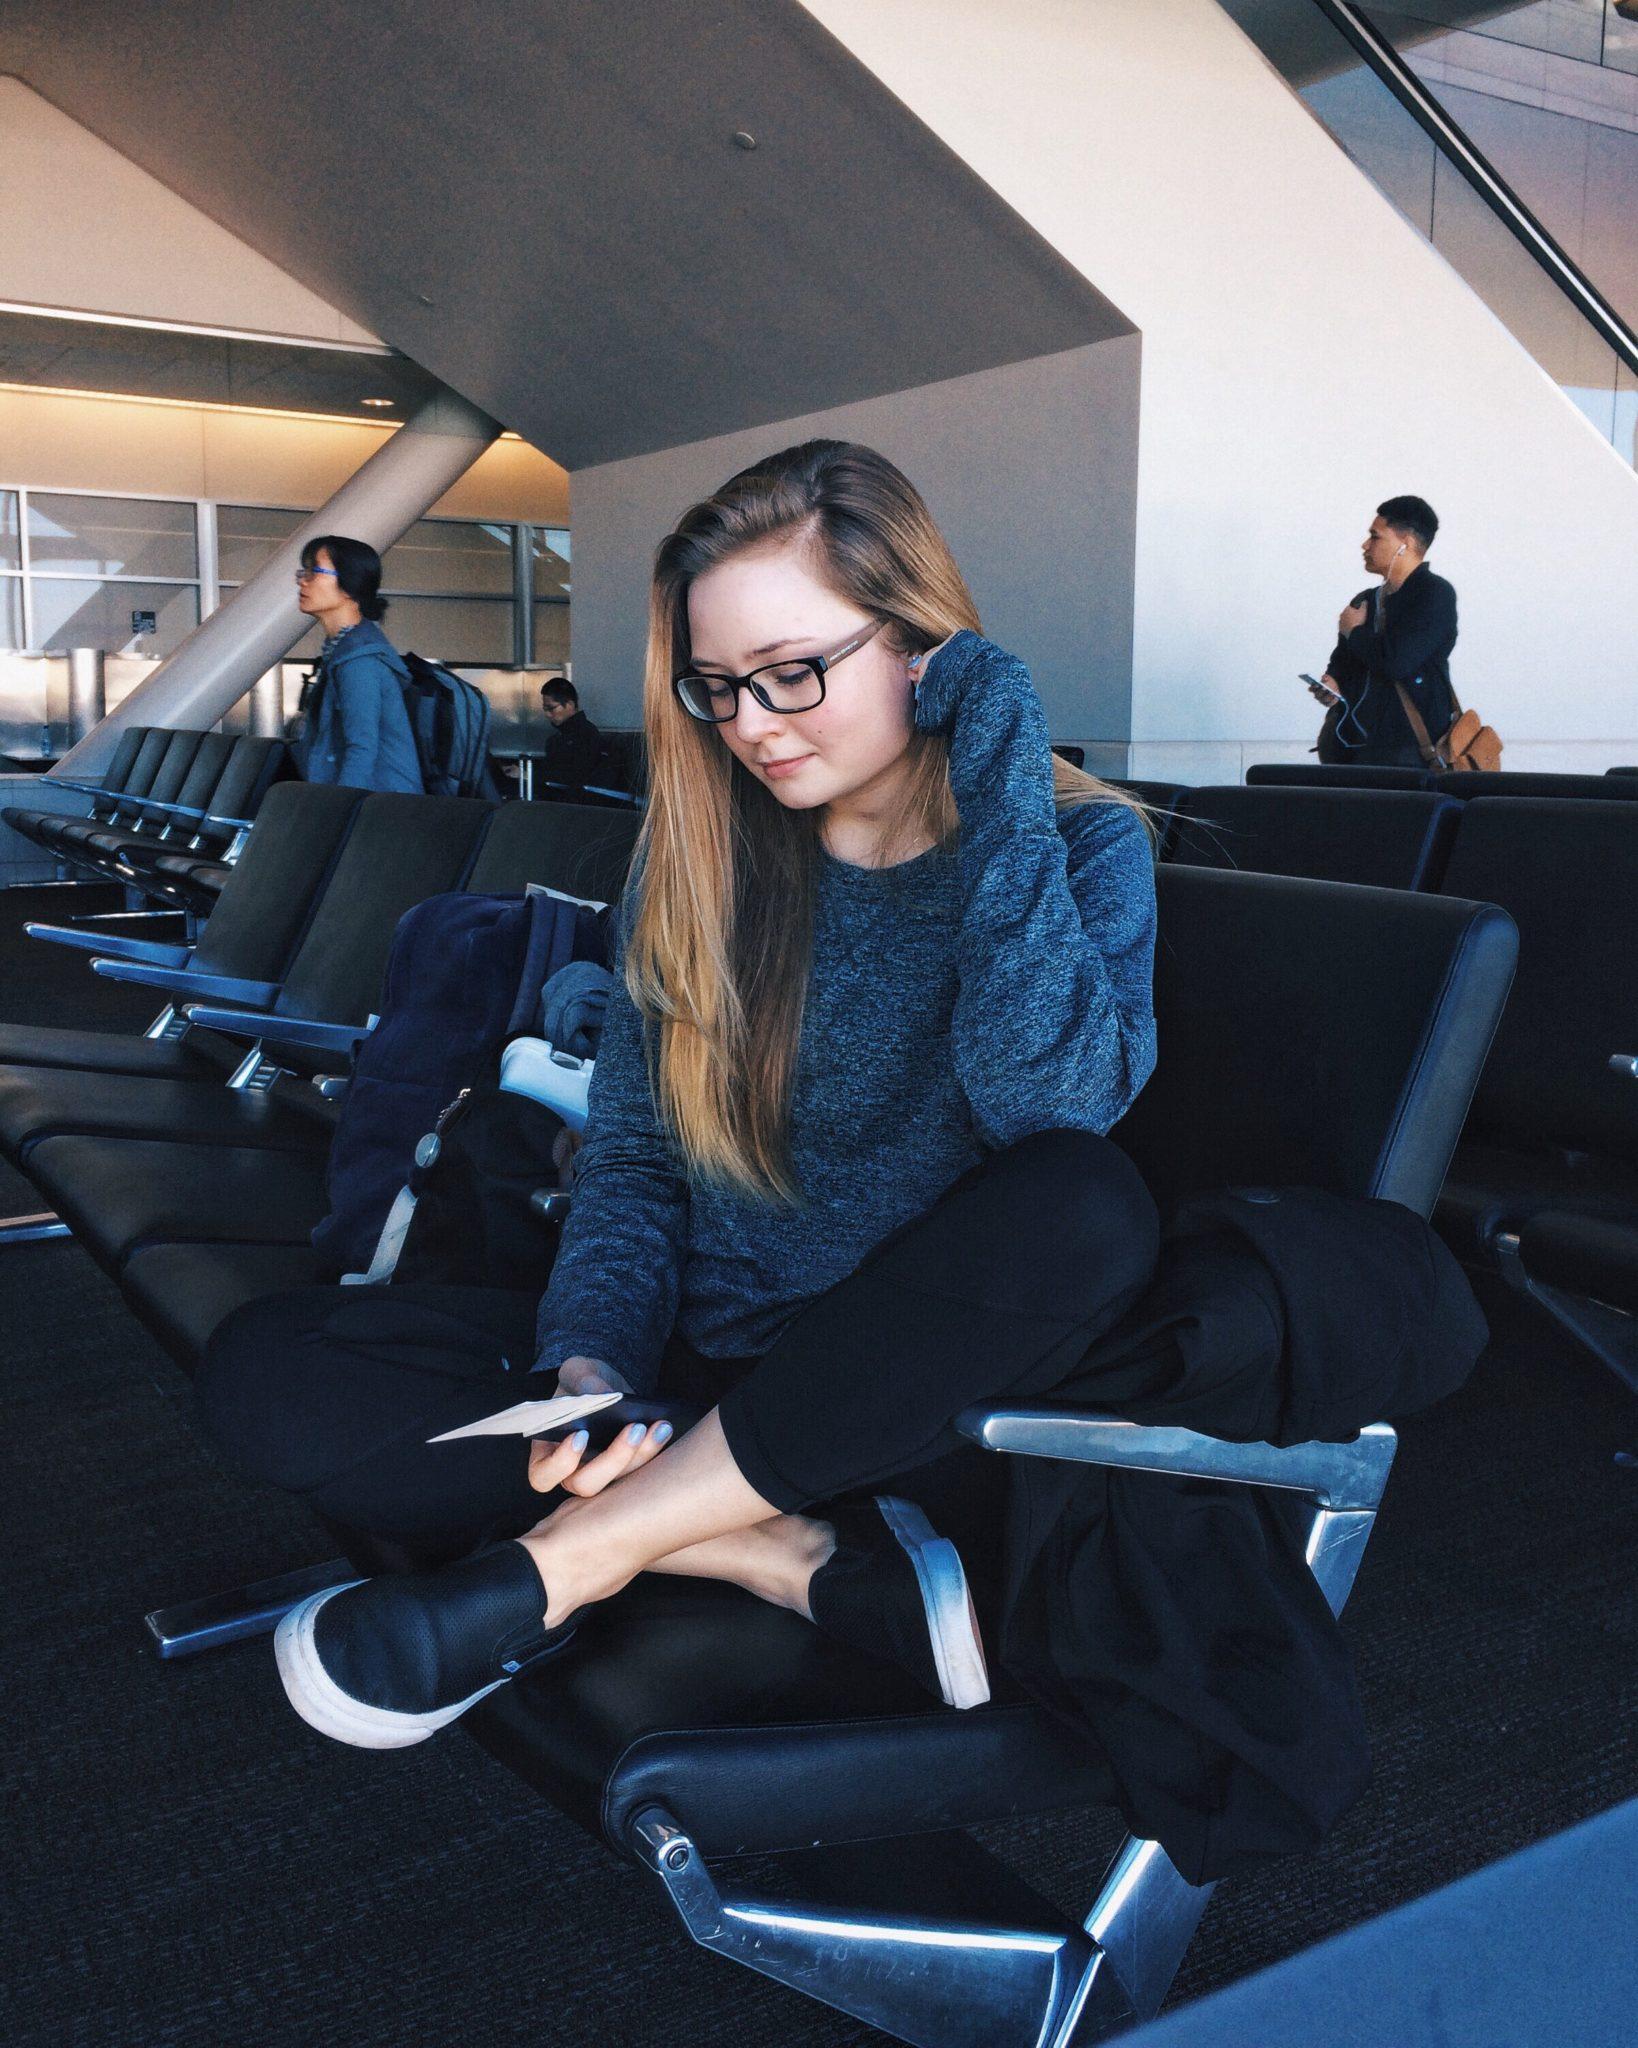 jana meerman airport